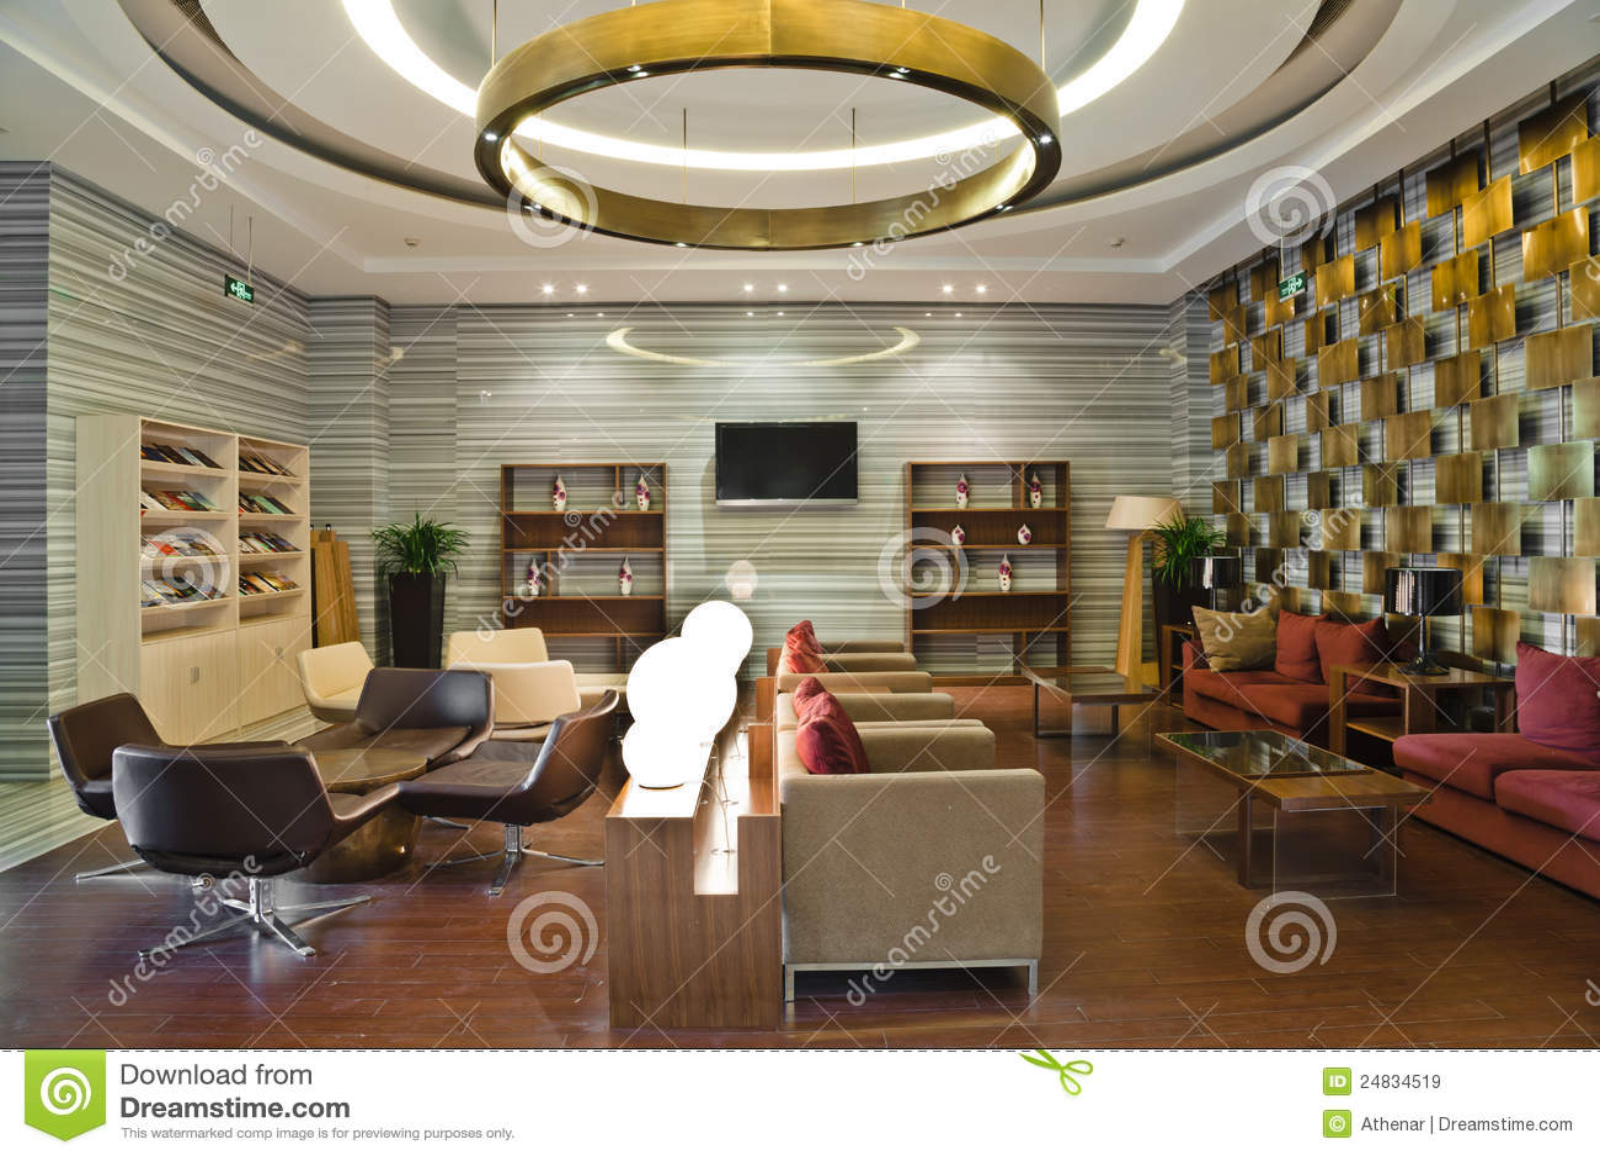 Modern Building Lobby Lounge Stock Image